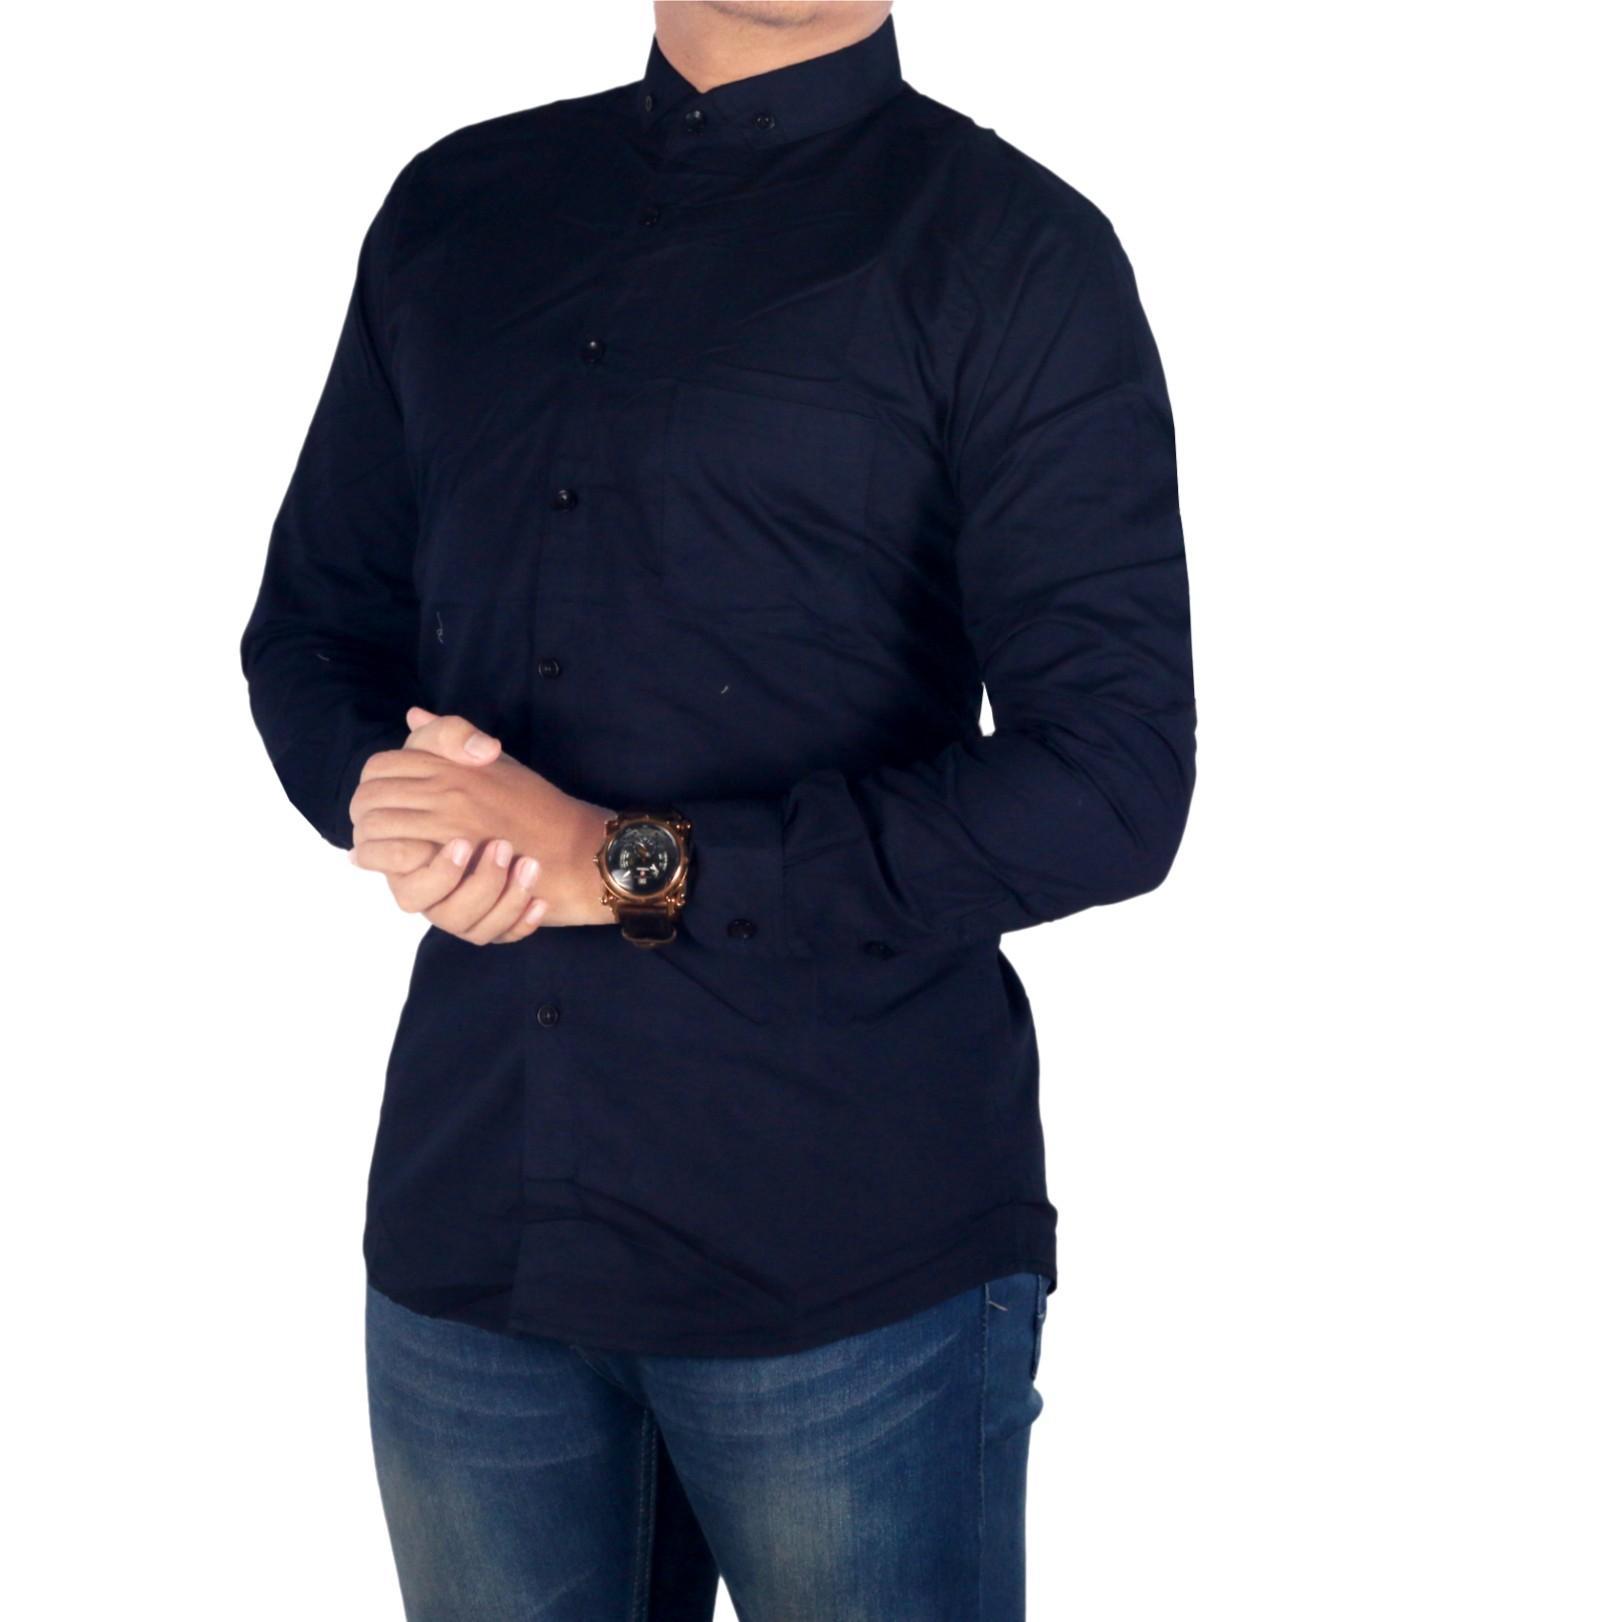 Dgm_Fashion1 Kemeja Polos Biru Lengan Panjang/ Flanel/Kemeja Woll/Kemeja Beckham/Kemeja Casual/Kemeja Polos/Kemeja Distro/Kemeja Kantoran/Kemeja Jeans/Kemeja Denim/Kemeja Pendek/Kemeja Tartan/Kemeja Pantai/Kemeja Bunga/Kemeja Man PX 4607